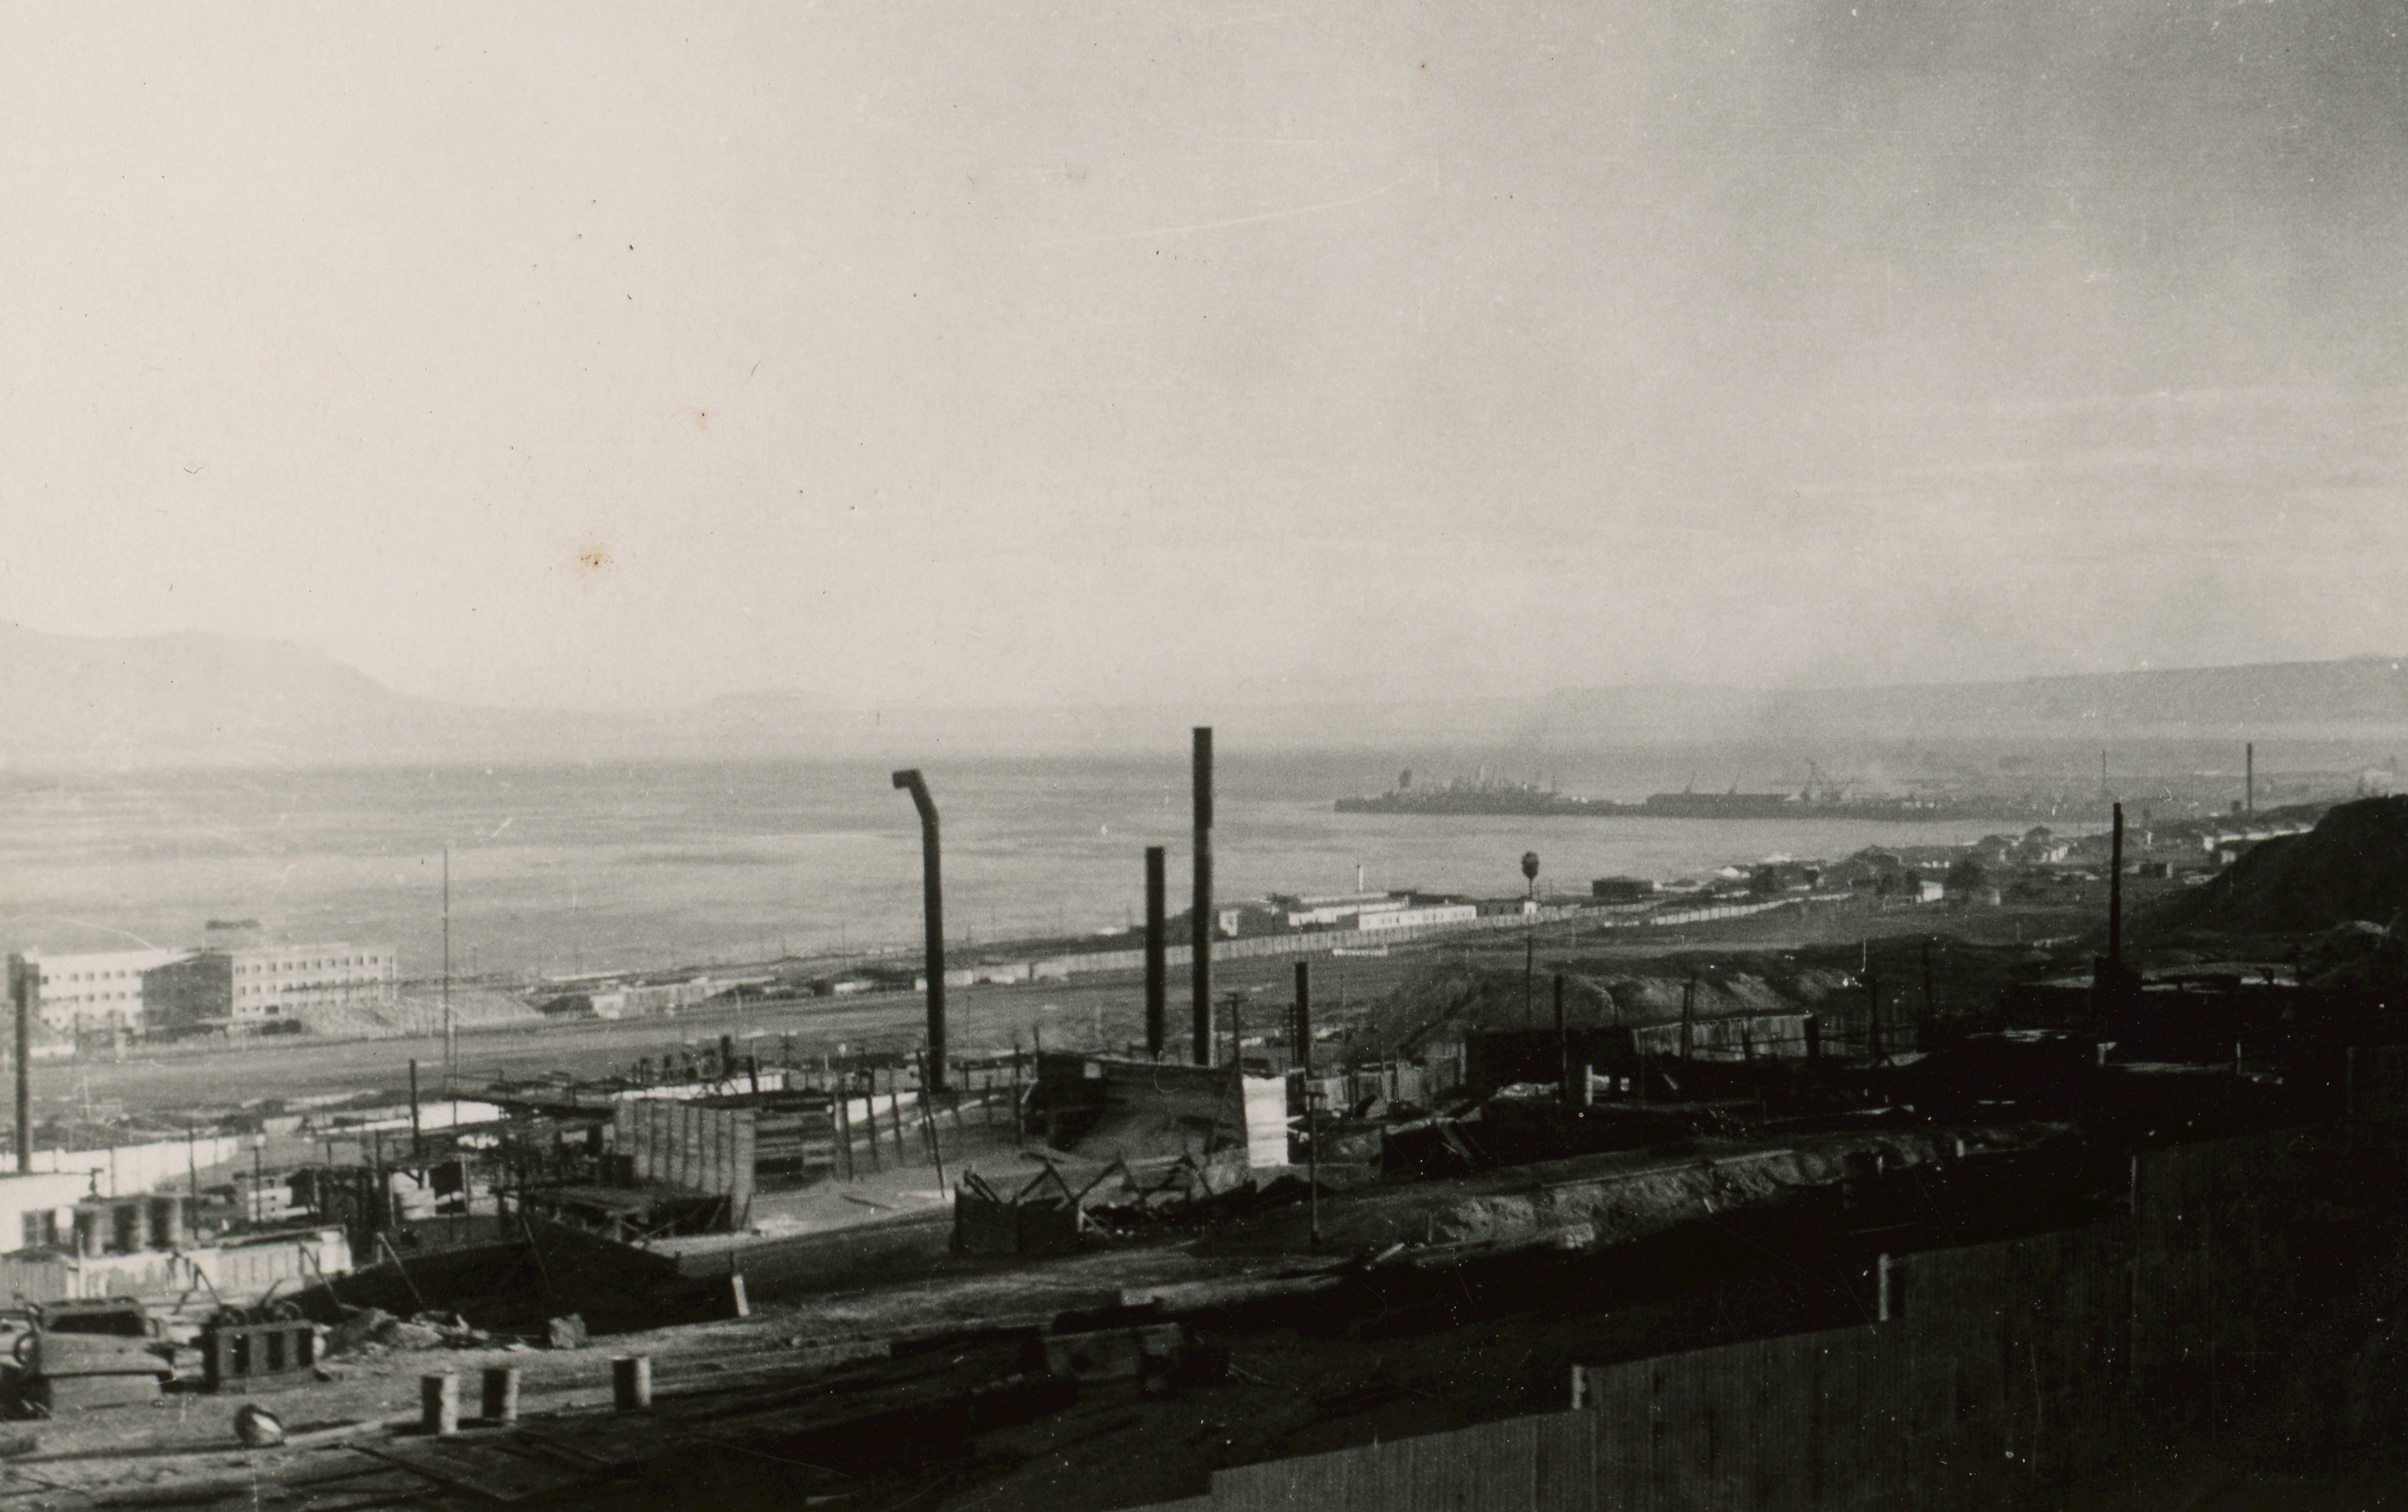 Enterreno - Fotos históricas de chile - fotos antiguas de Chile - Vista de Anntofagasta e 1950